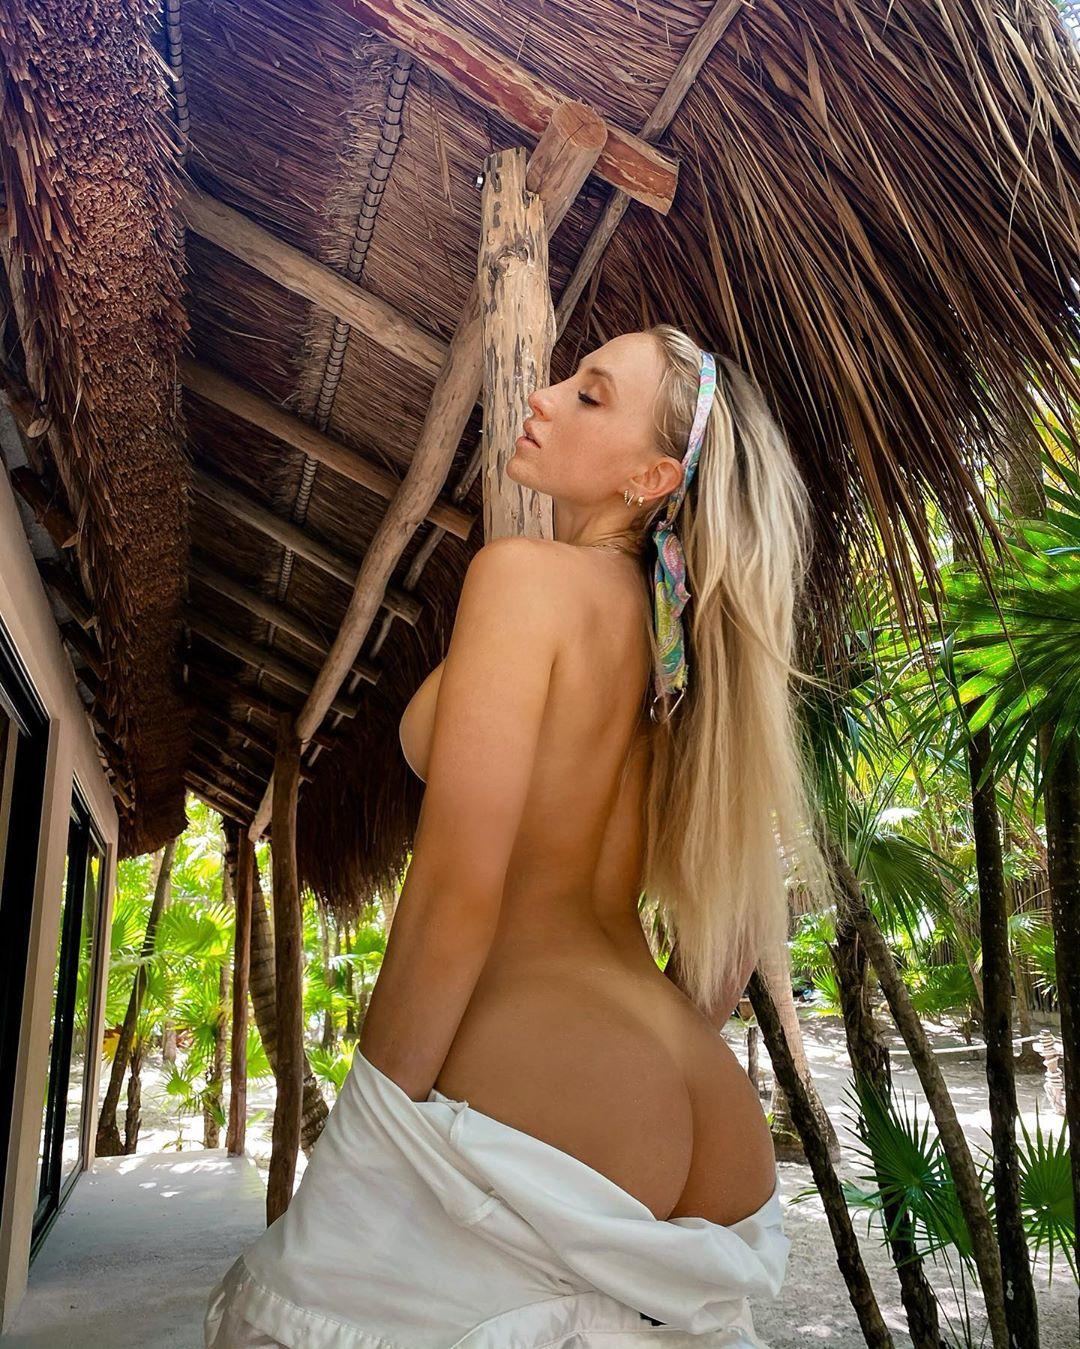 Lauren Dascalo Nude Onlyfans Leaked! 0012